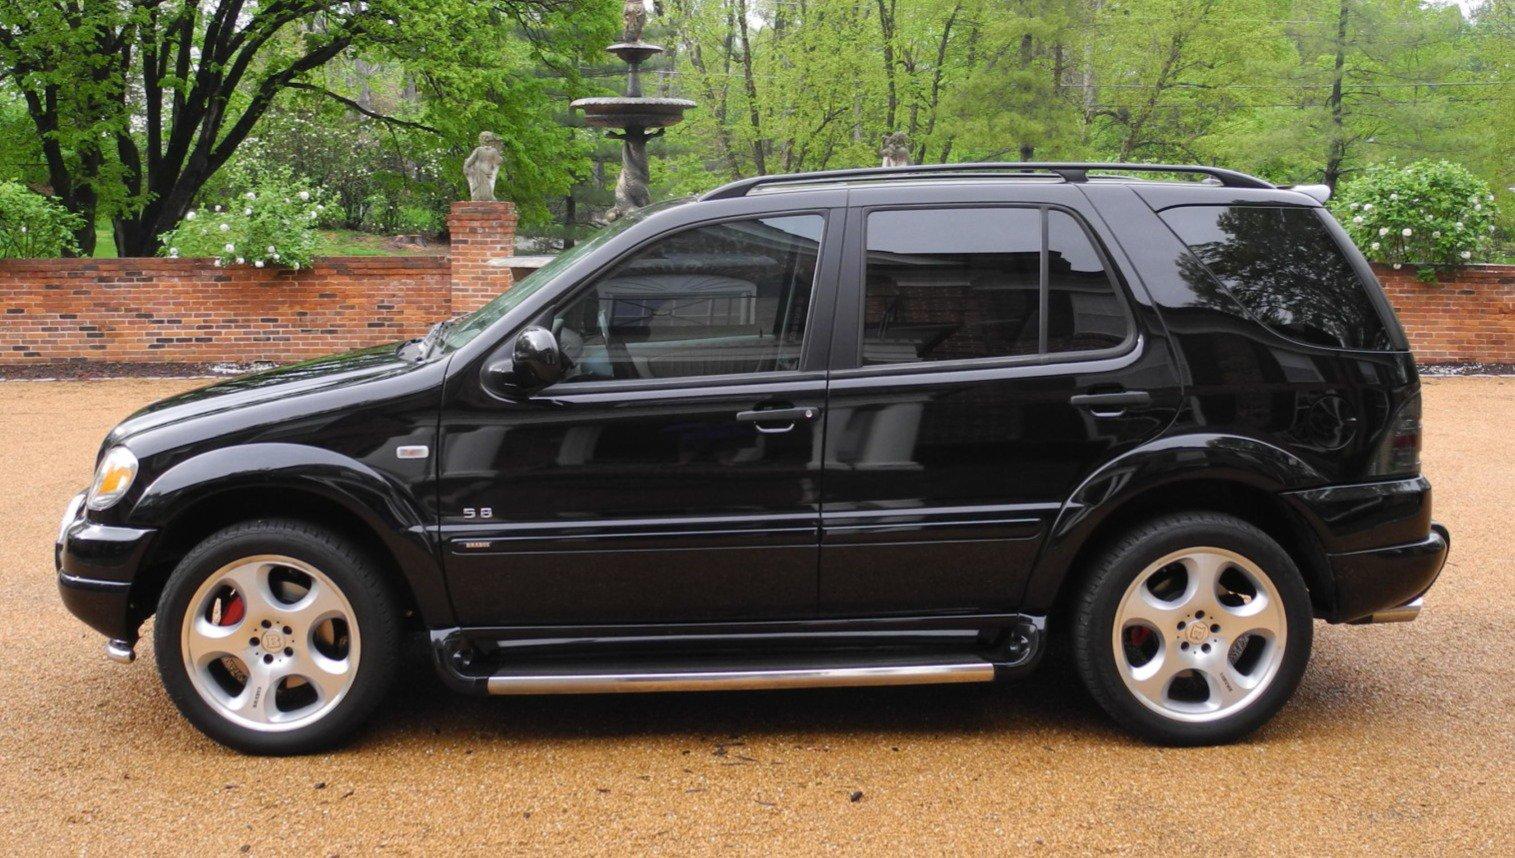 Mercedes ML 430 Brabus 2001 asta